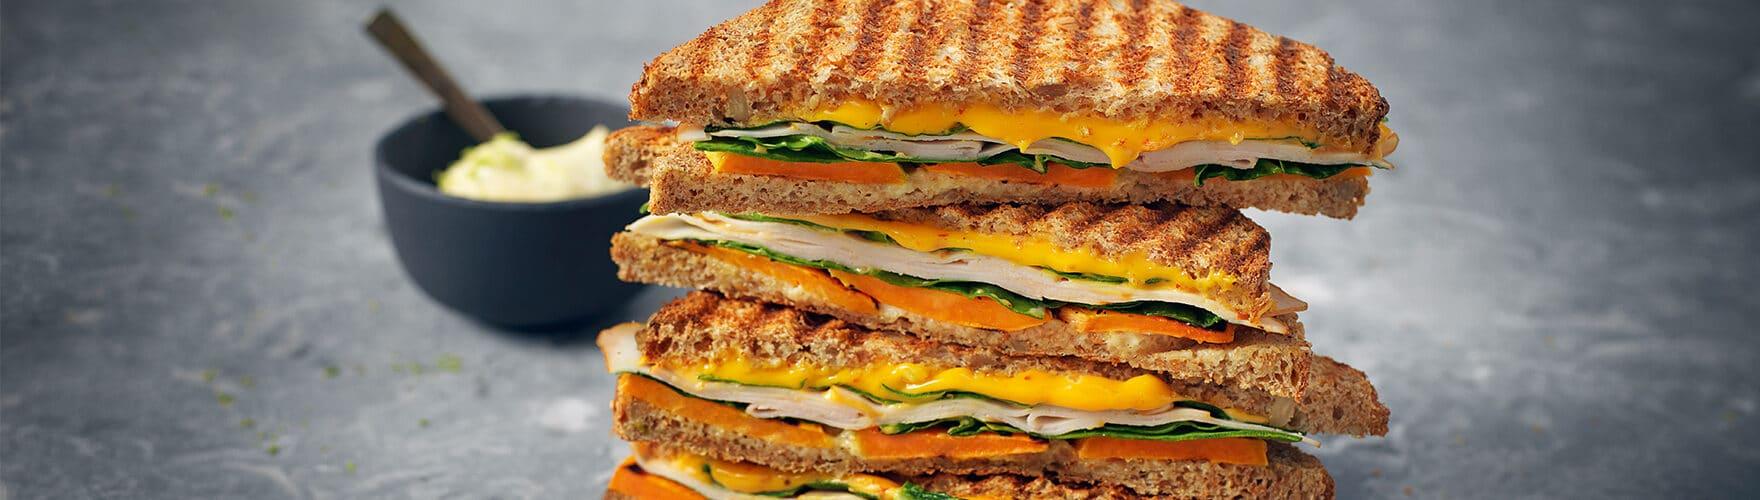 Tosti met cheddar, kipfilet, spinazie, zoete aardappel en limoen mayonaise